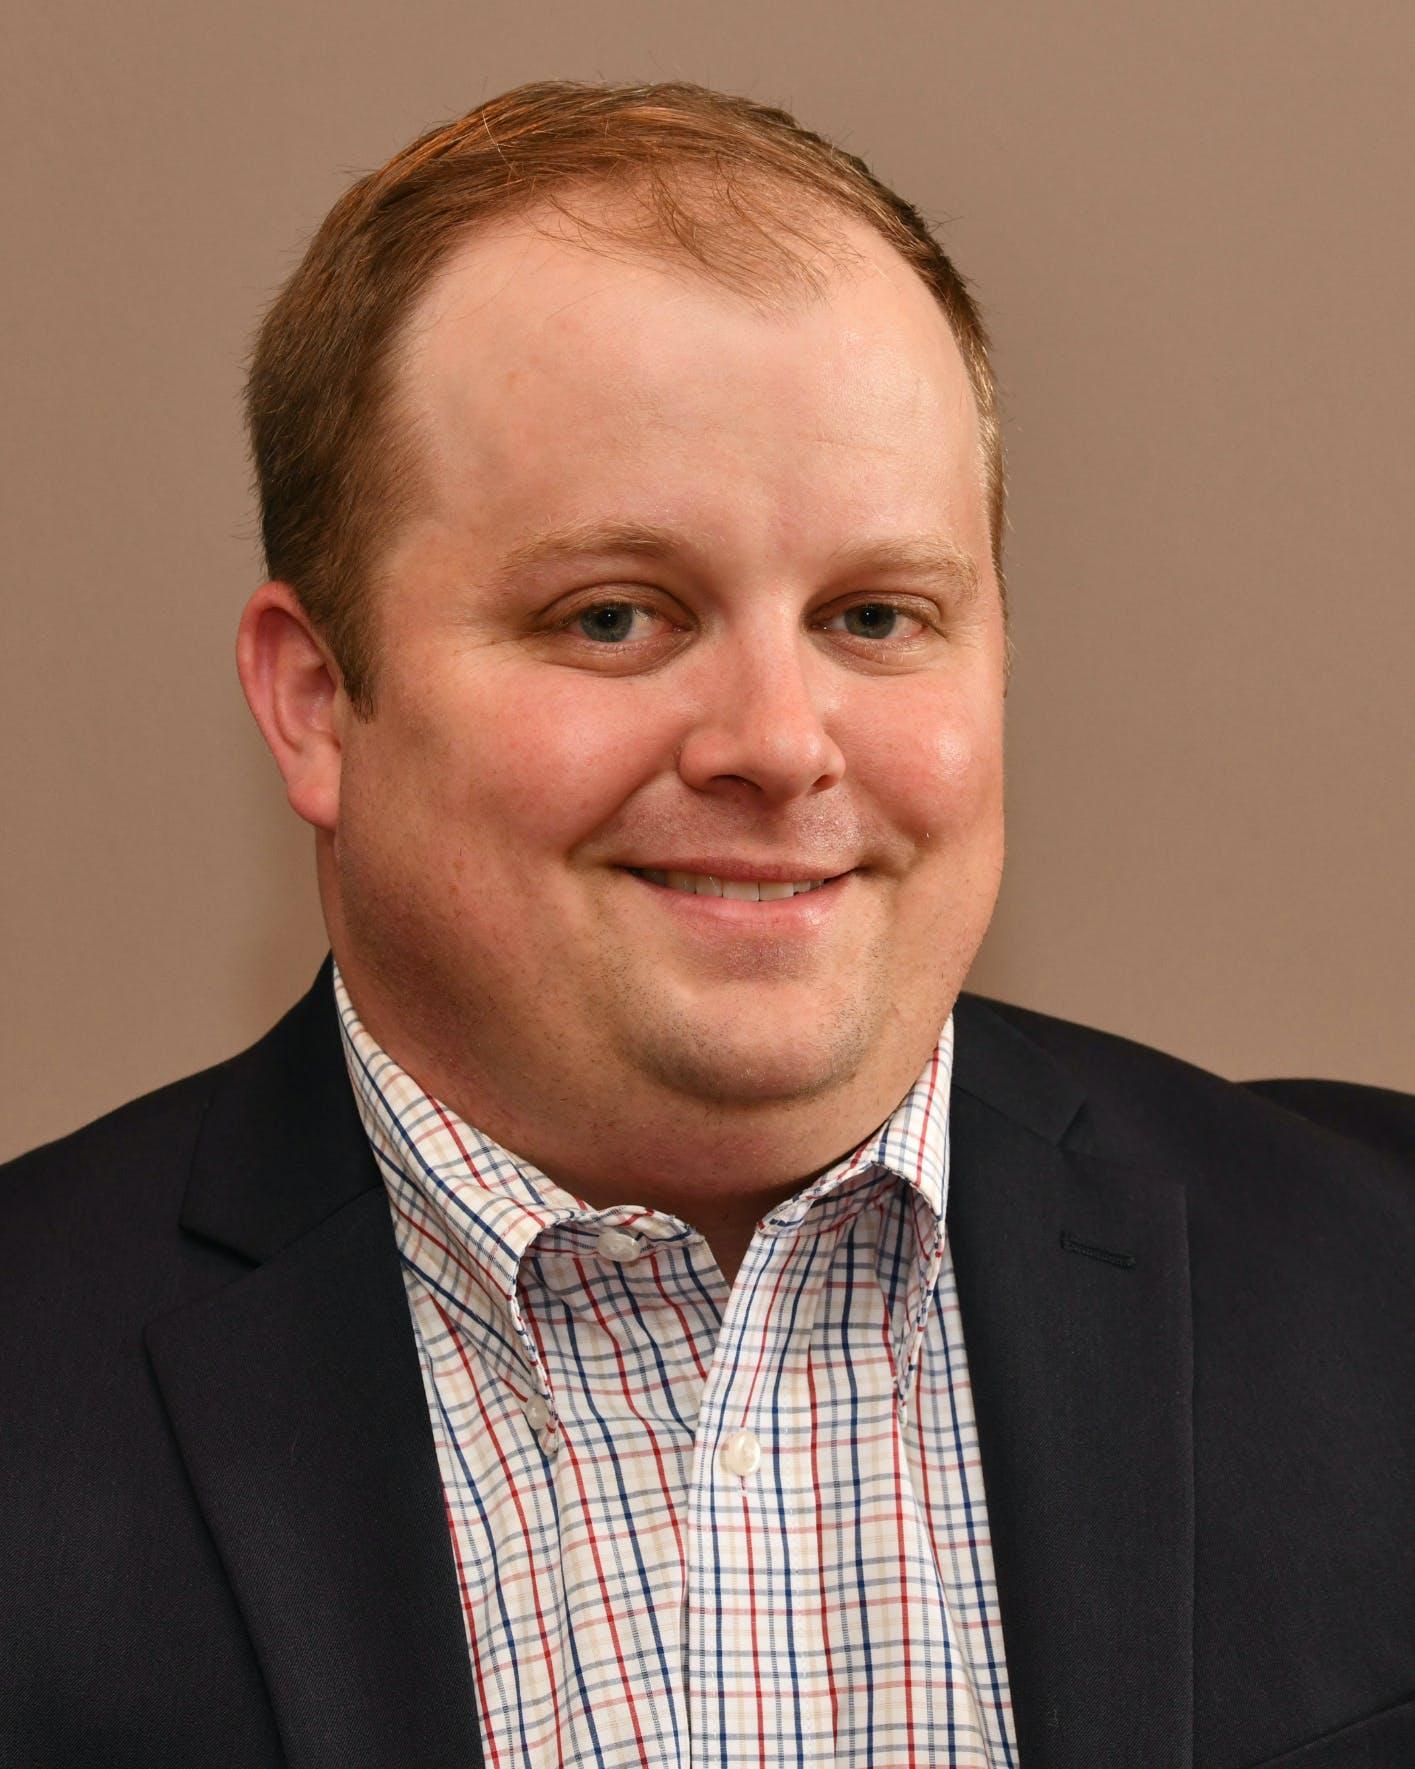 Profile photo of Ben Ziemann